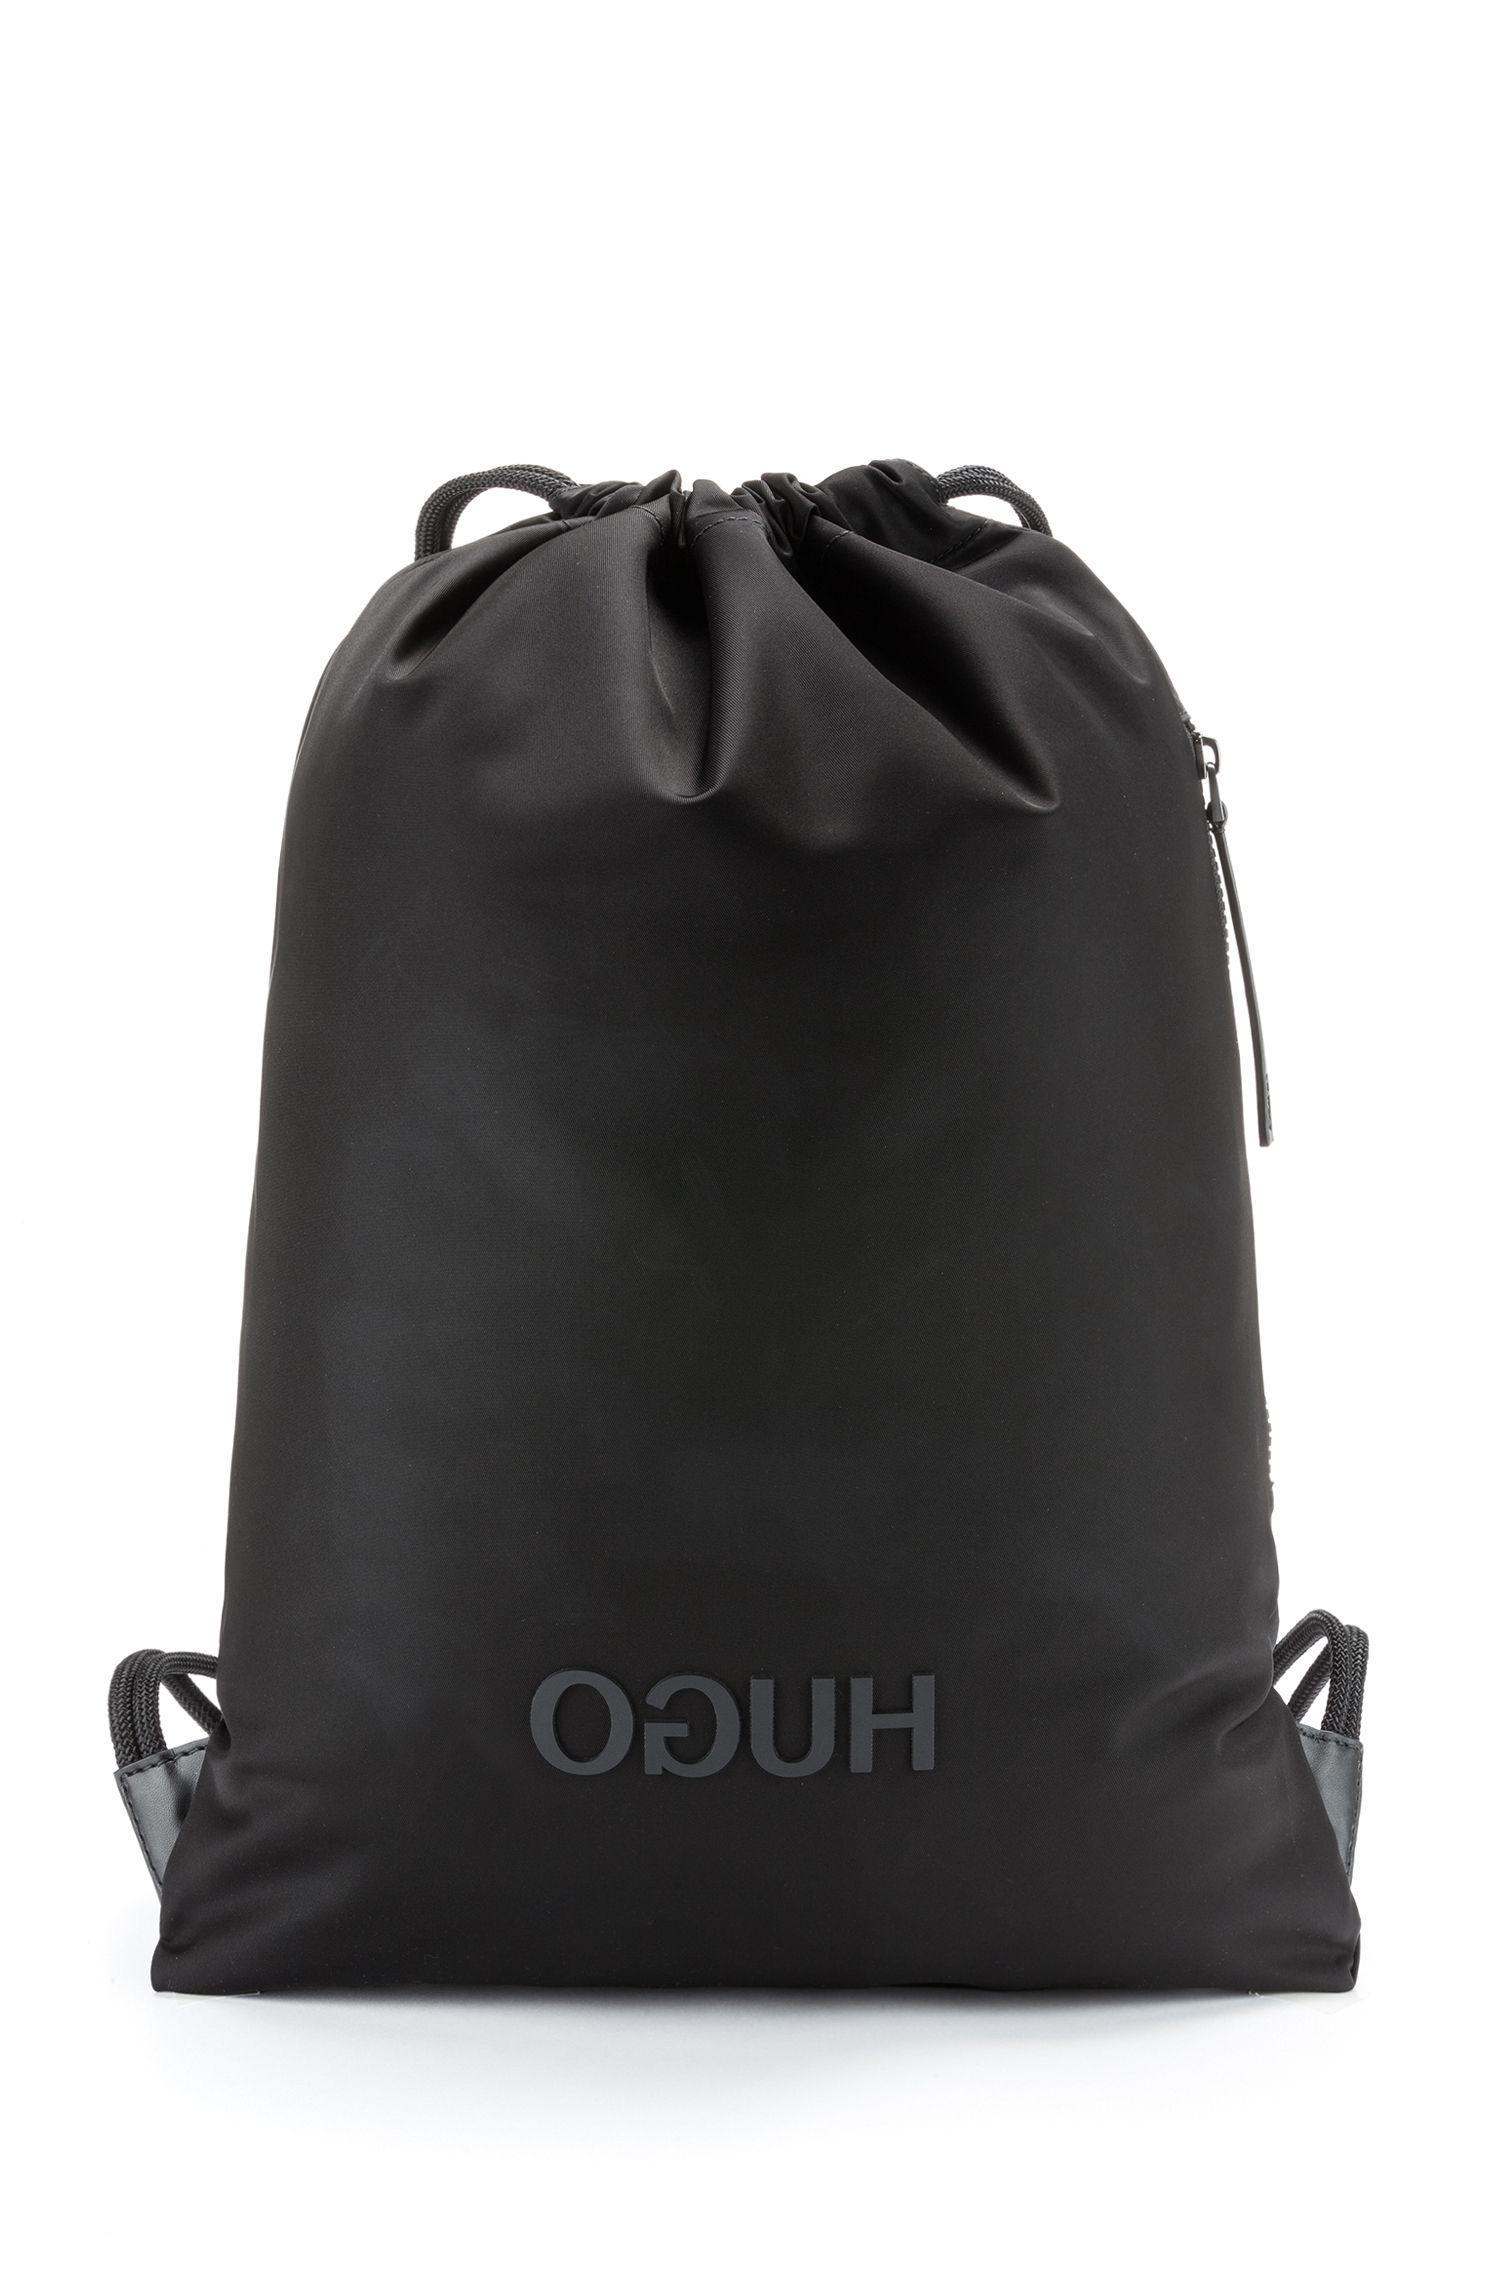 Hugo Boss - Mochila de cordones en tejido de gabardina de nylon con logo invertido - 1